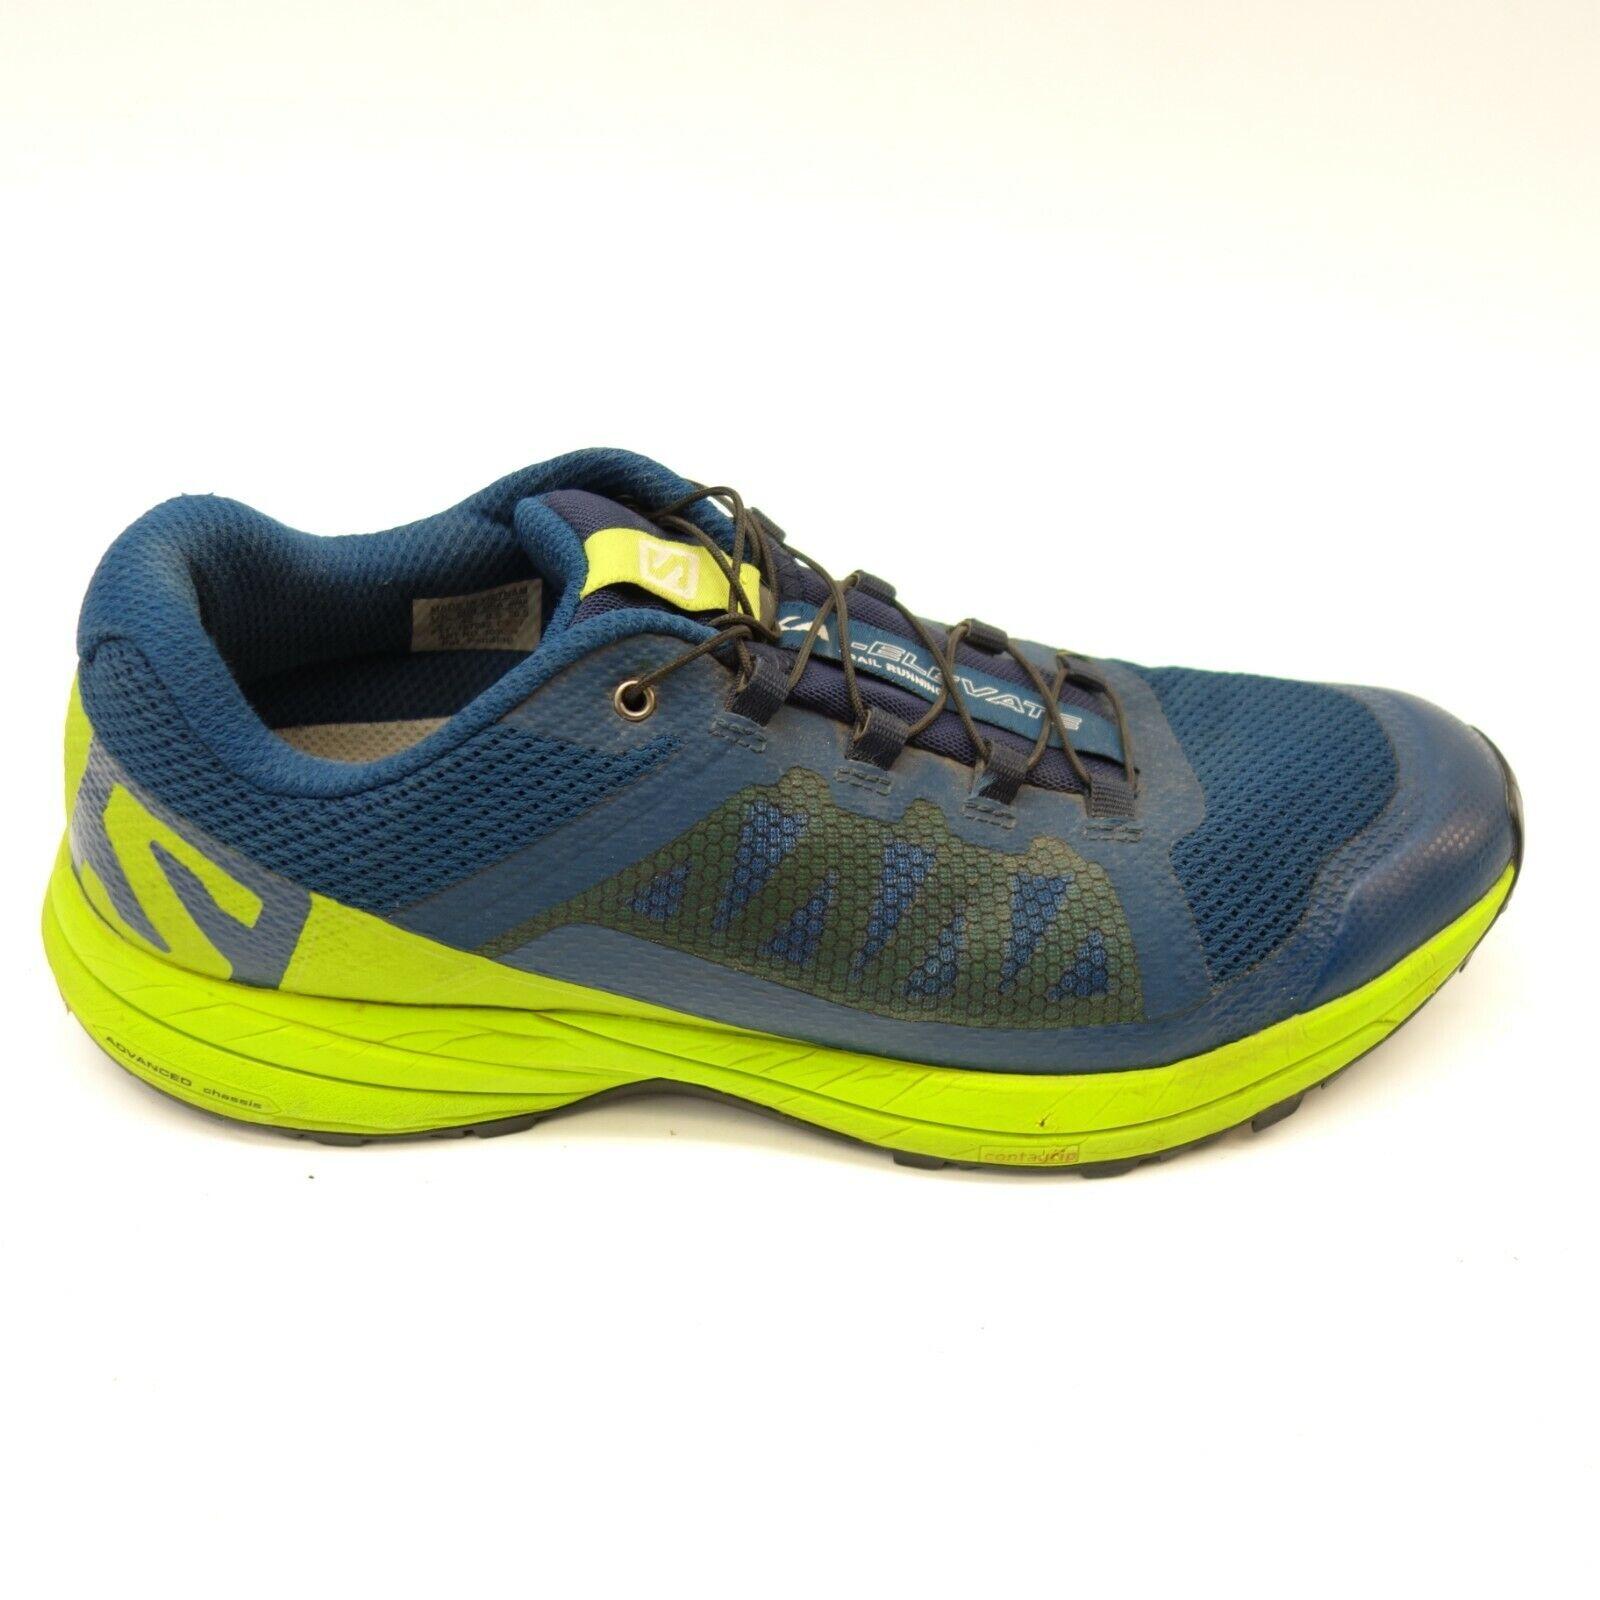 Salomon Mens XA Elevate Trail Running bluee Athletic Hiking Mountain shoes Sz 8.5